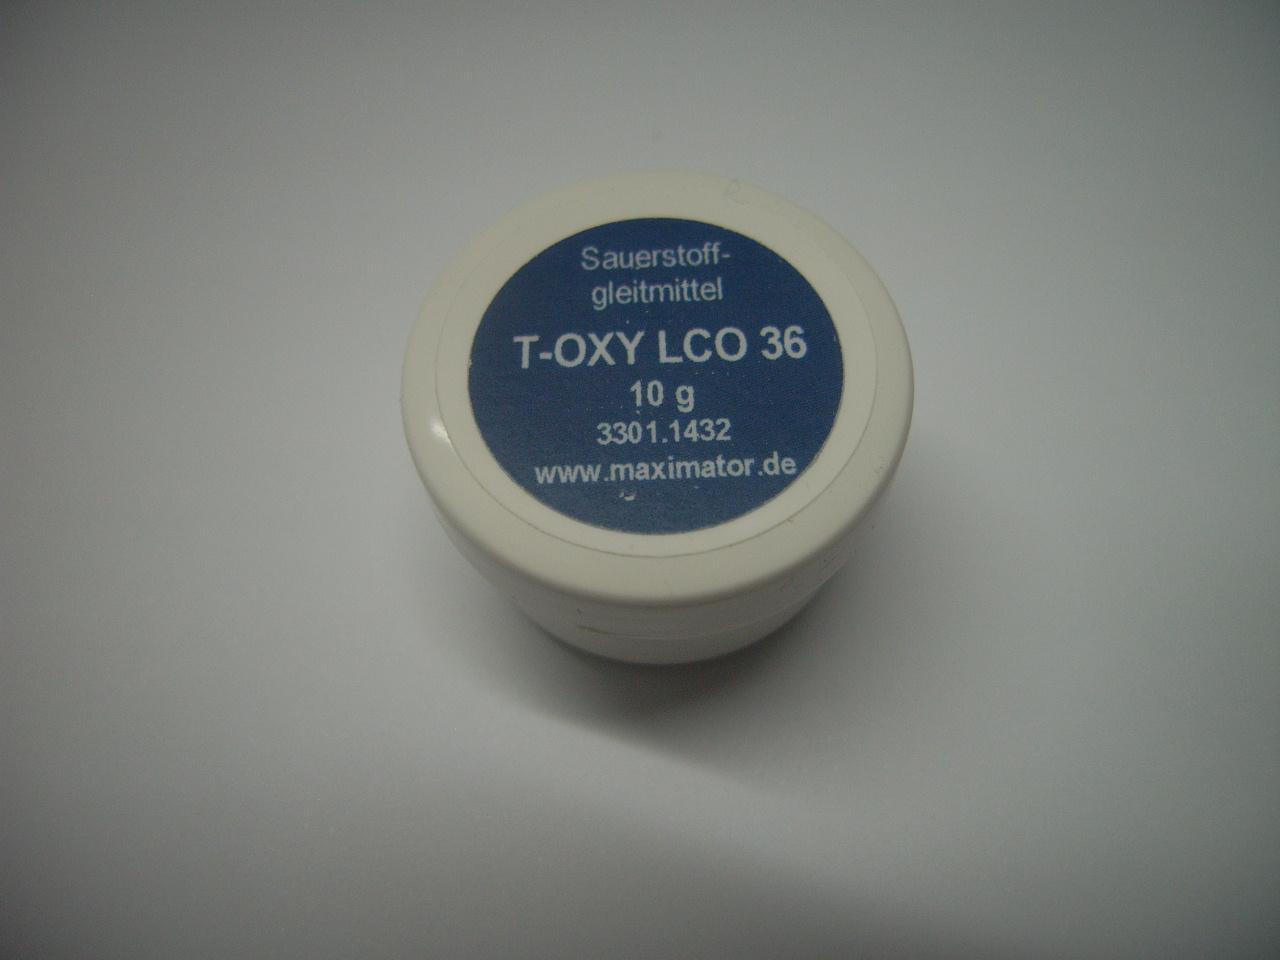 T-Oxy LCO 36, Sauerstoffgleitmittel, 10 g